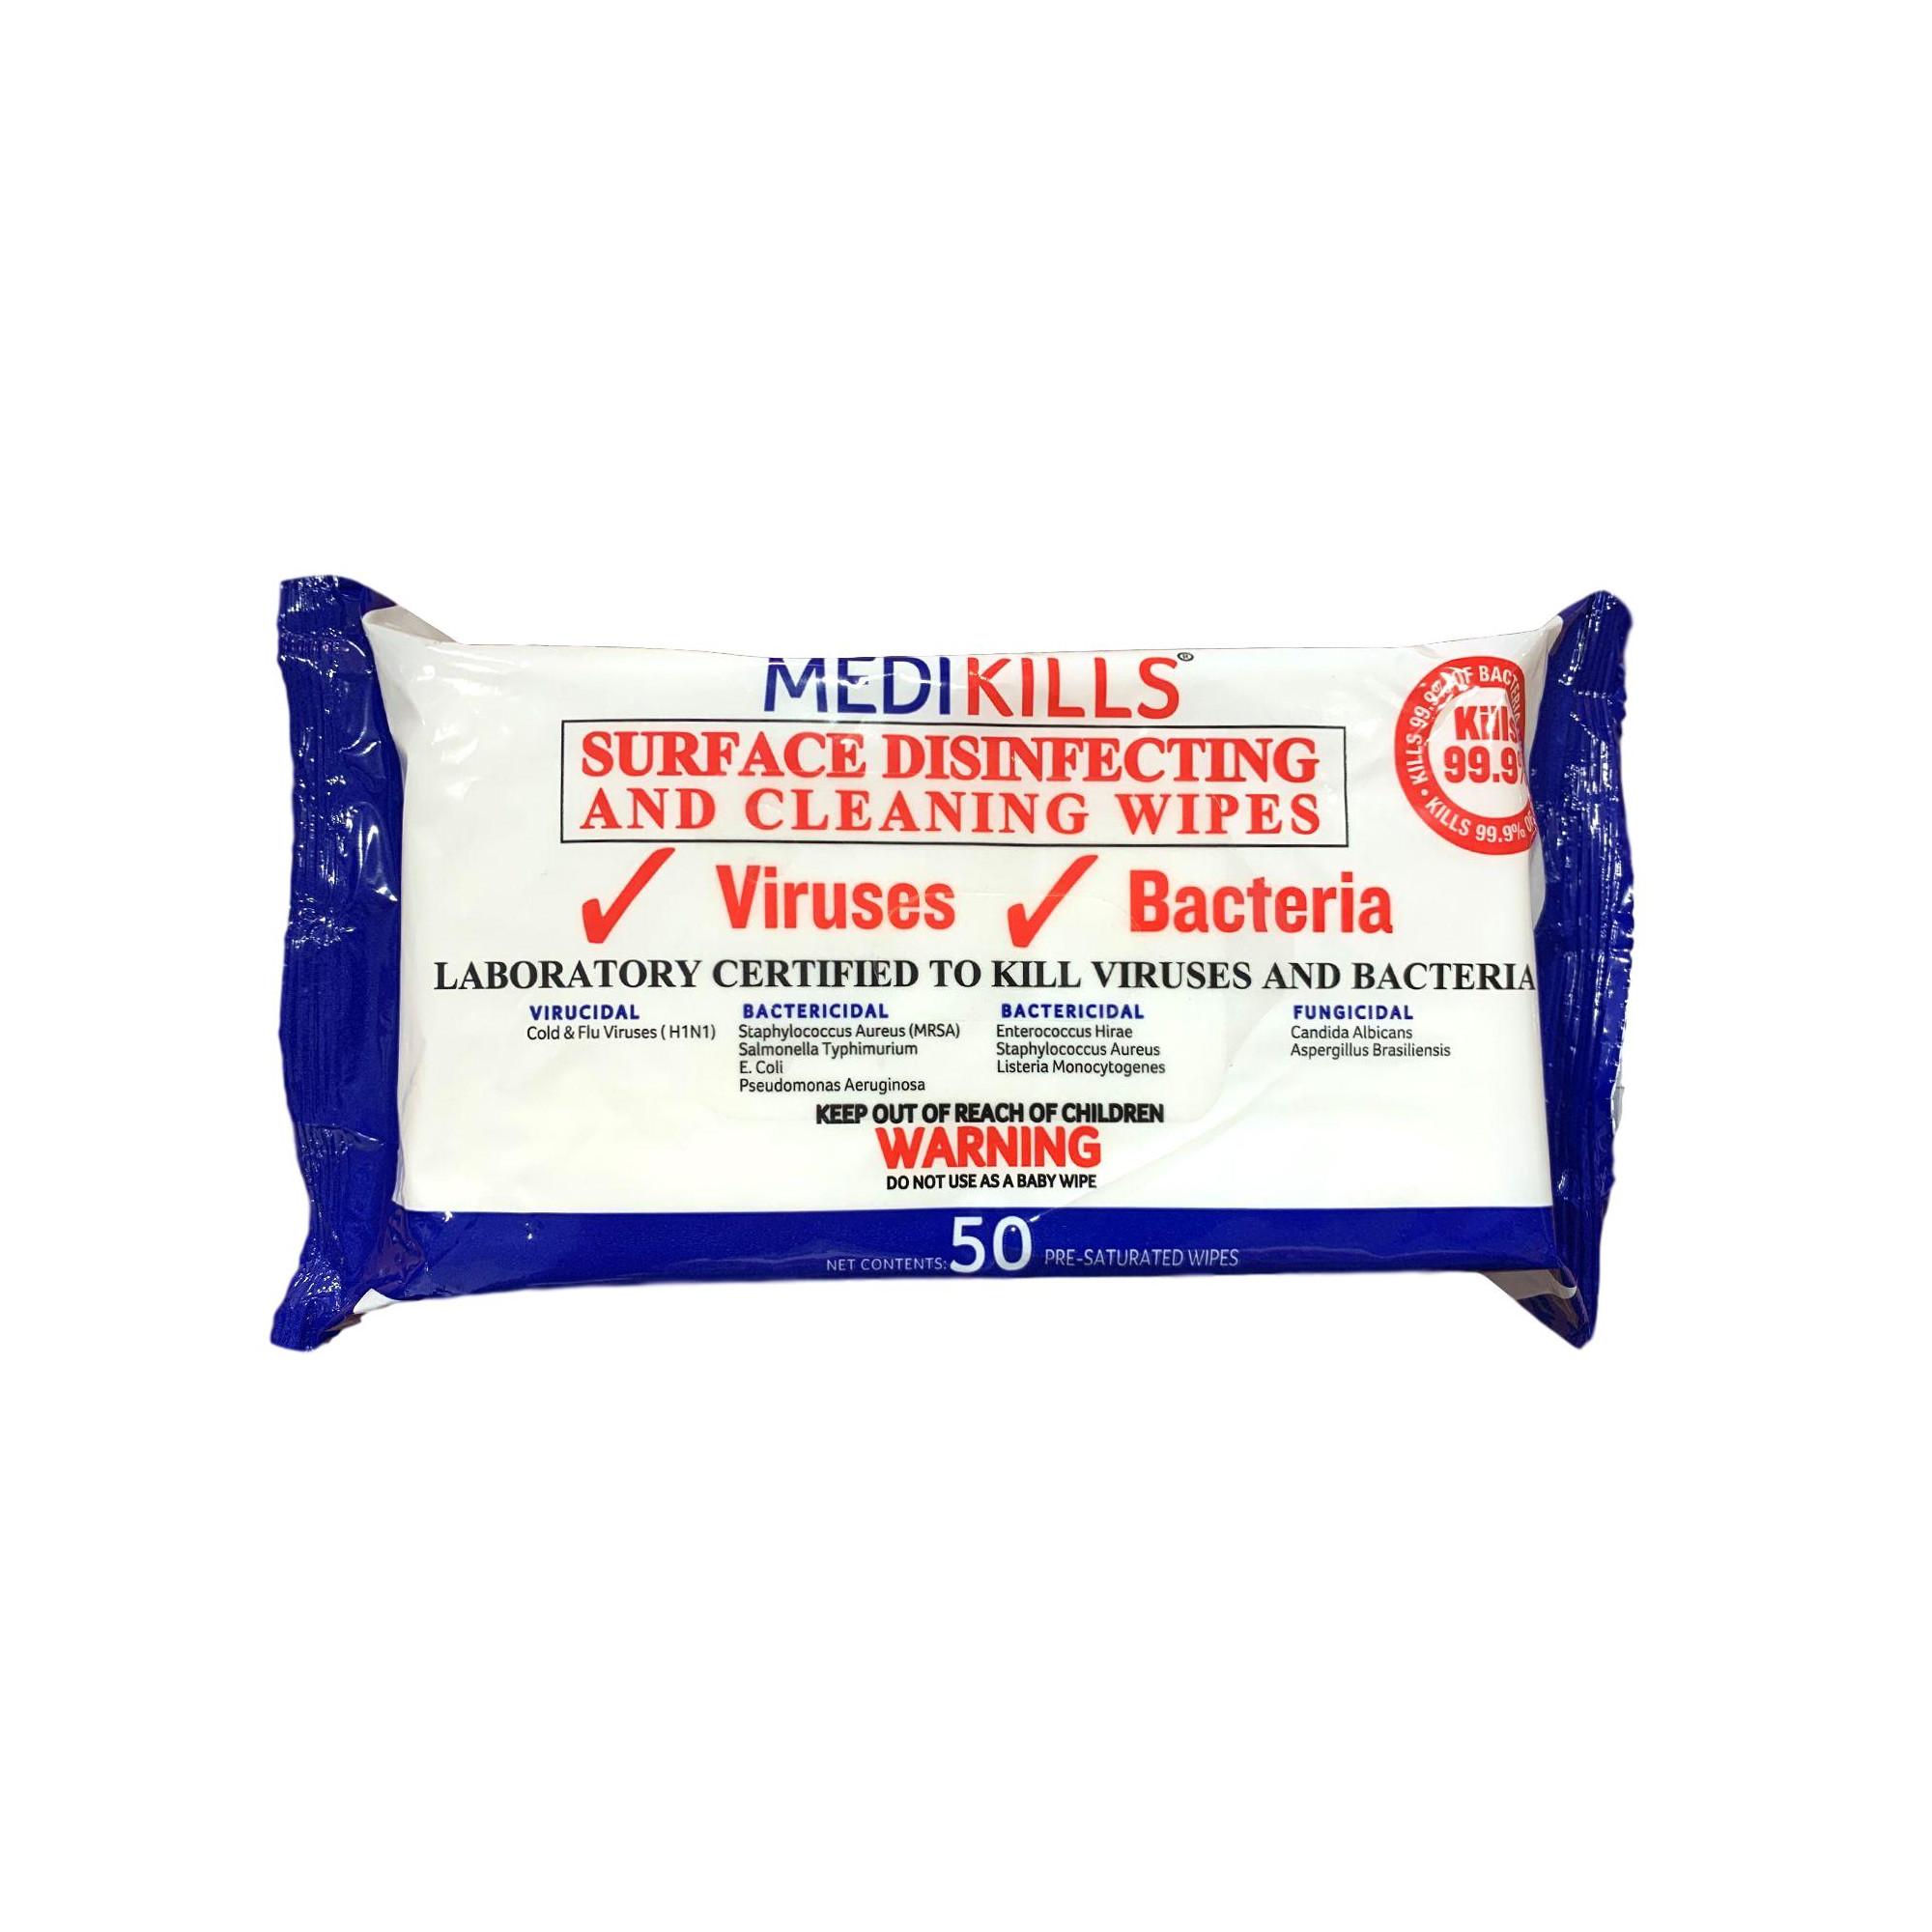 Lingettes virucides - Sachet de 50 lingettes